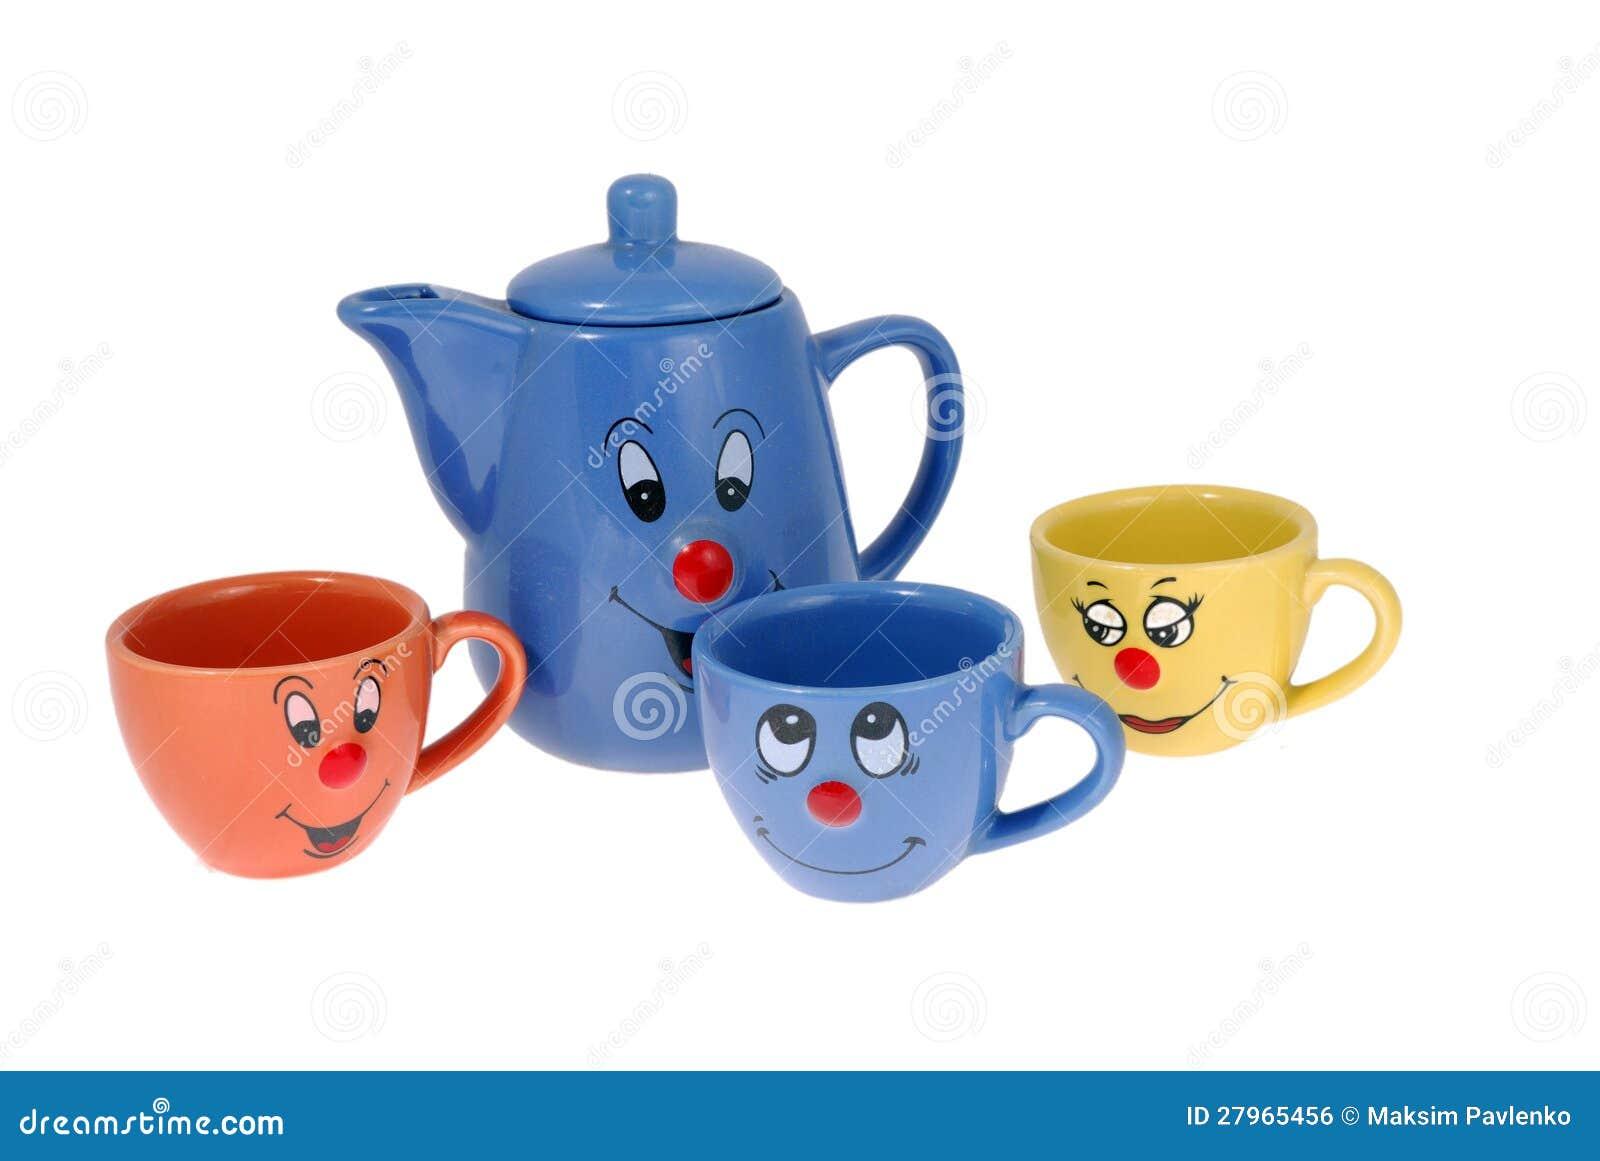 tea mugs and coffee cups royalty free stock image image